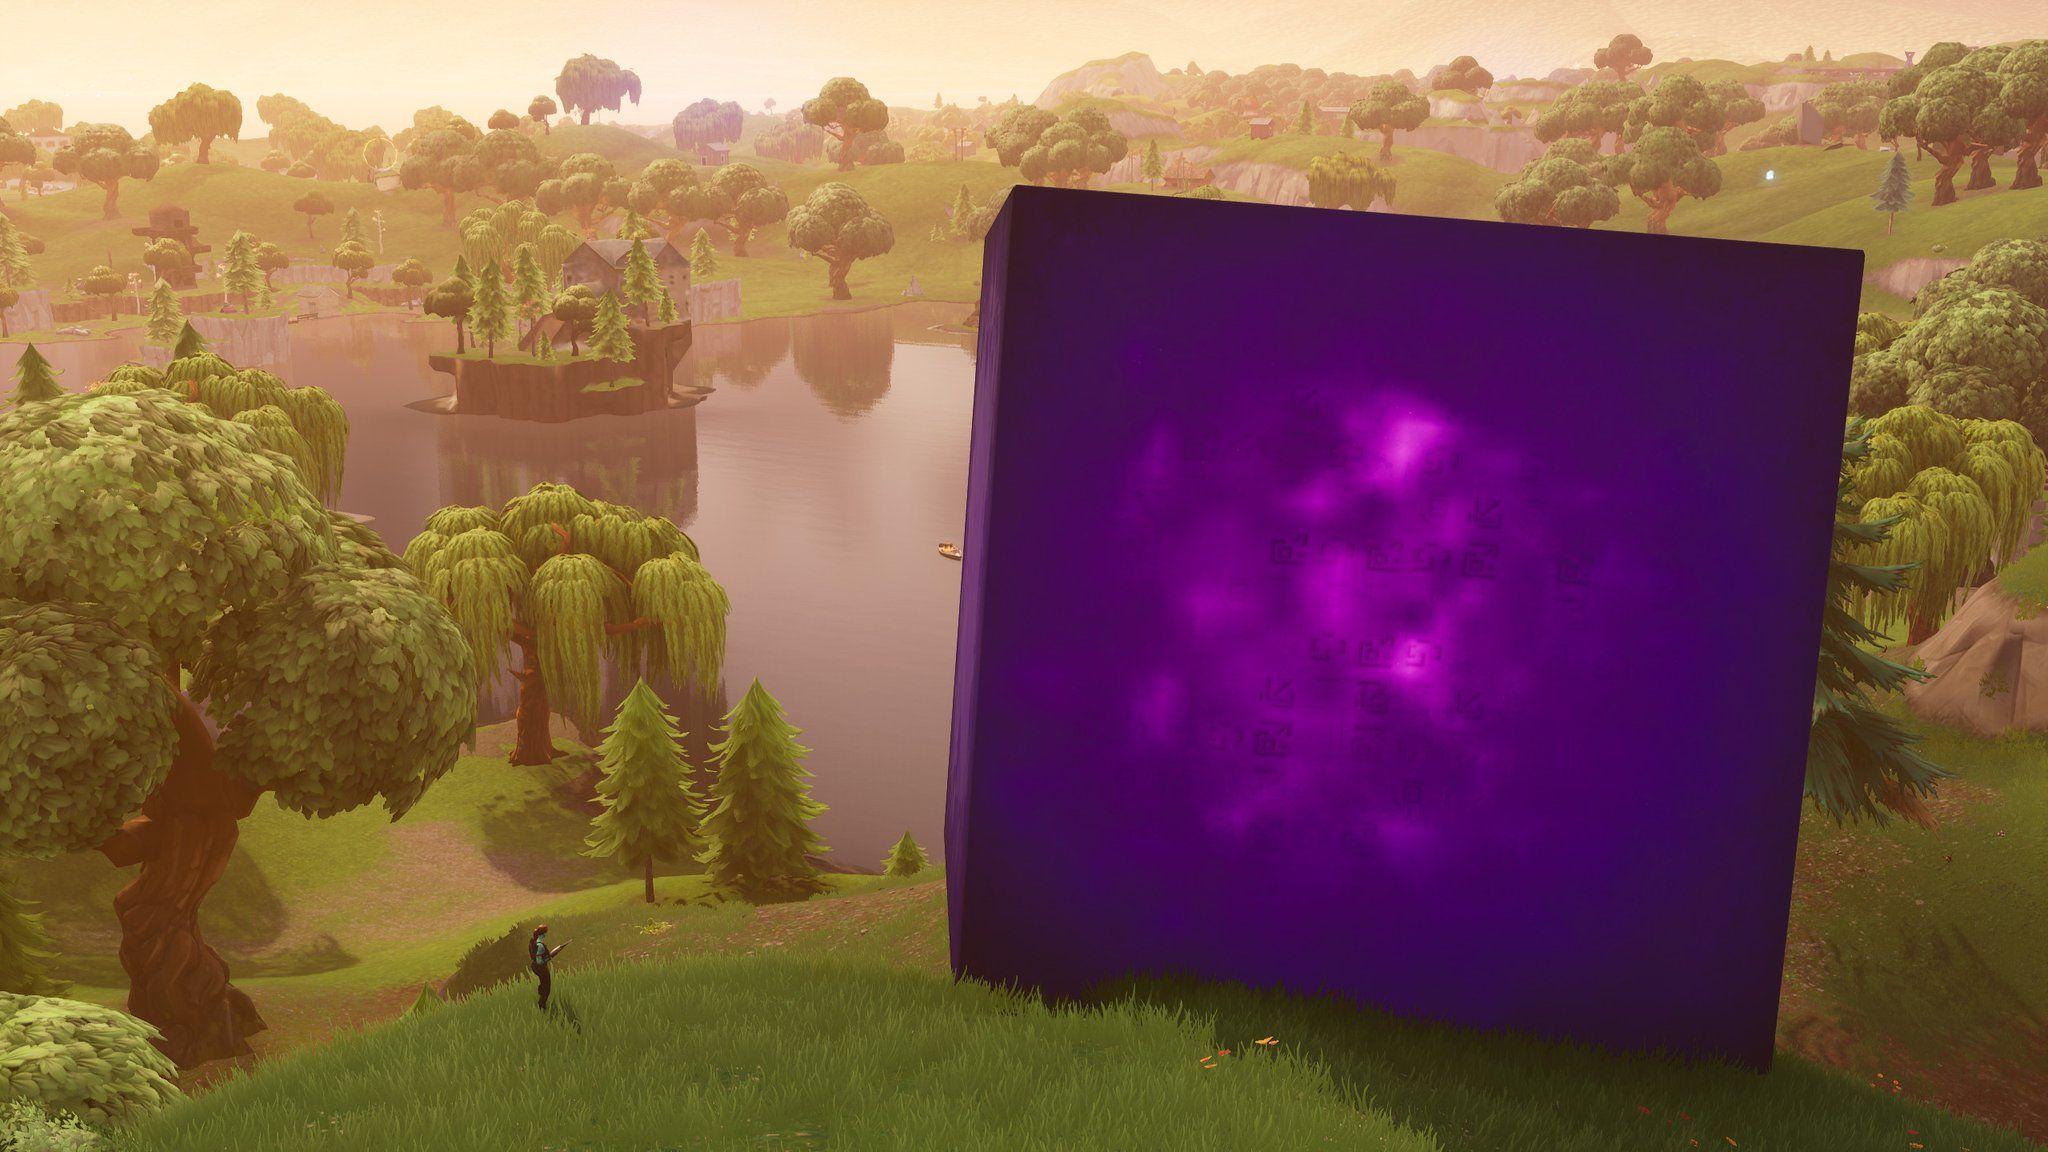 Fortnite Cube Live Event Makes Loot Lake Bouncy Adds Purple Smoke